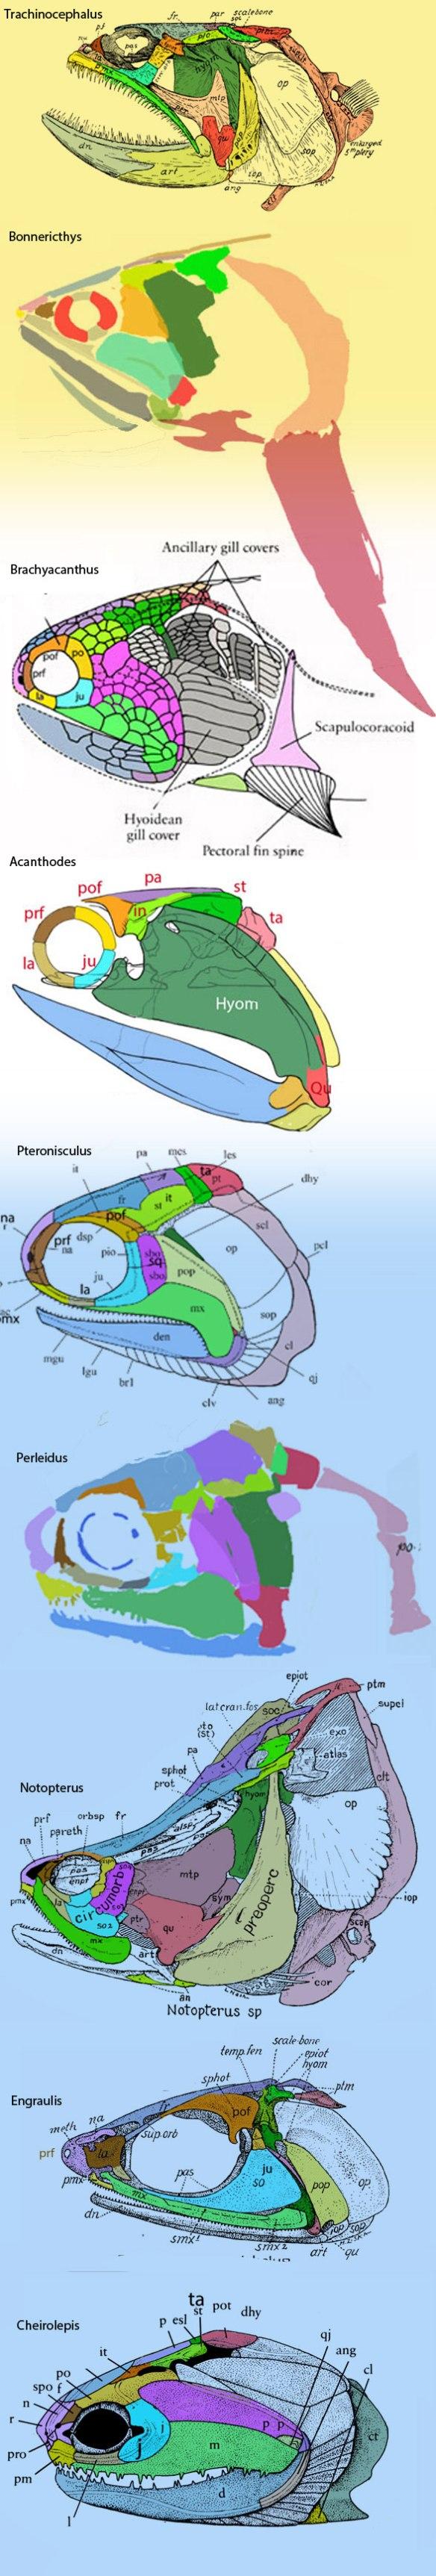 Figure 4. Acanthodian skulls, plus those of ancestors and related taxa.